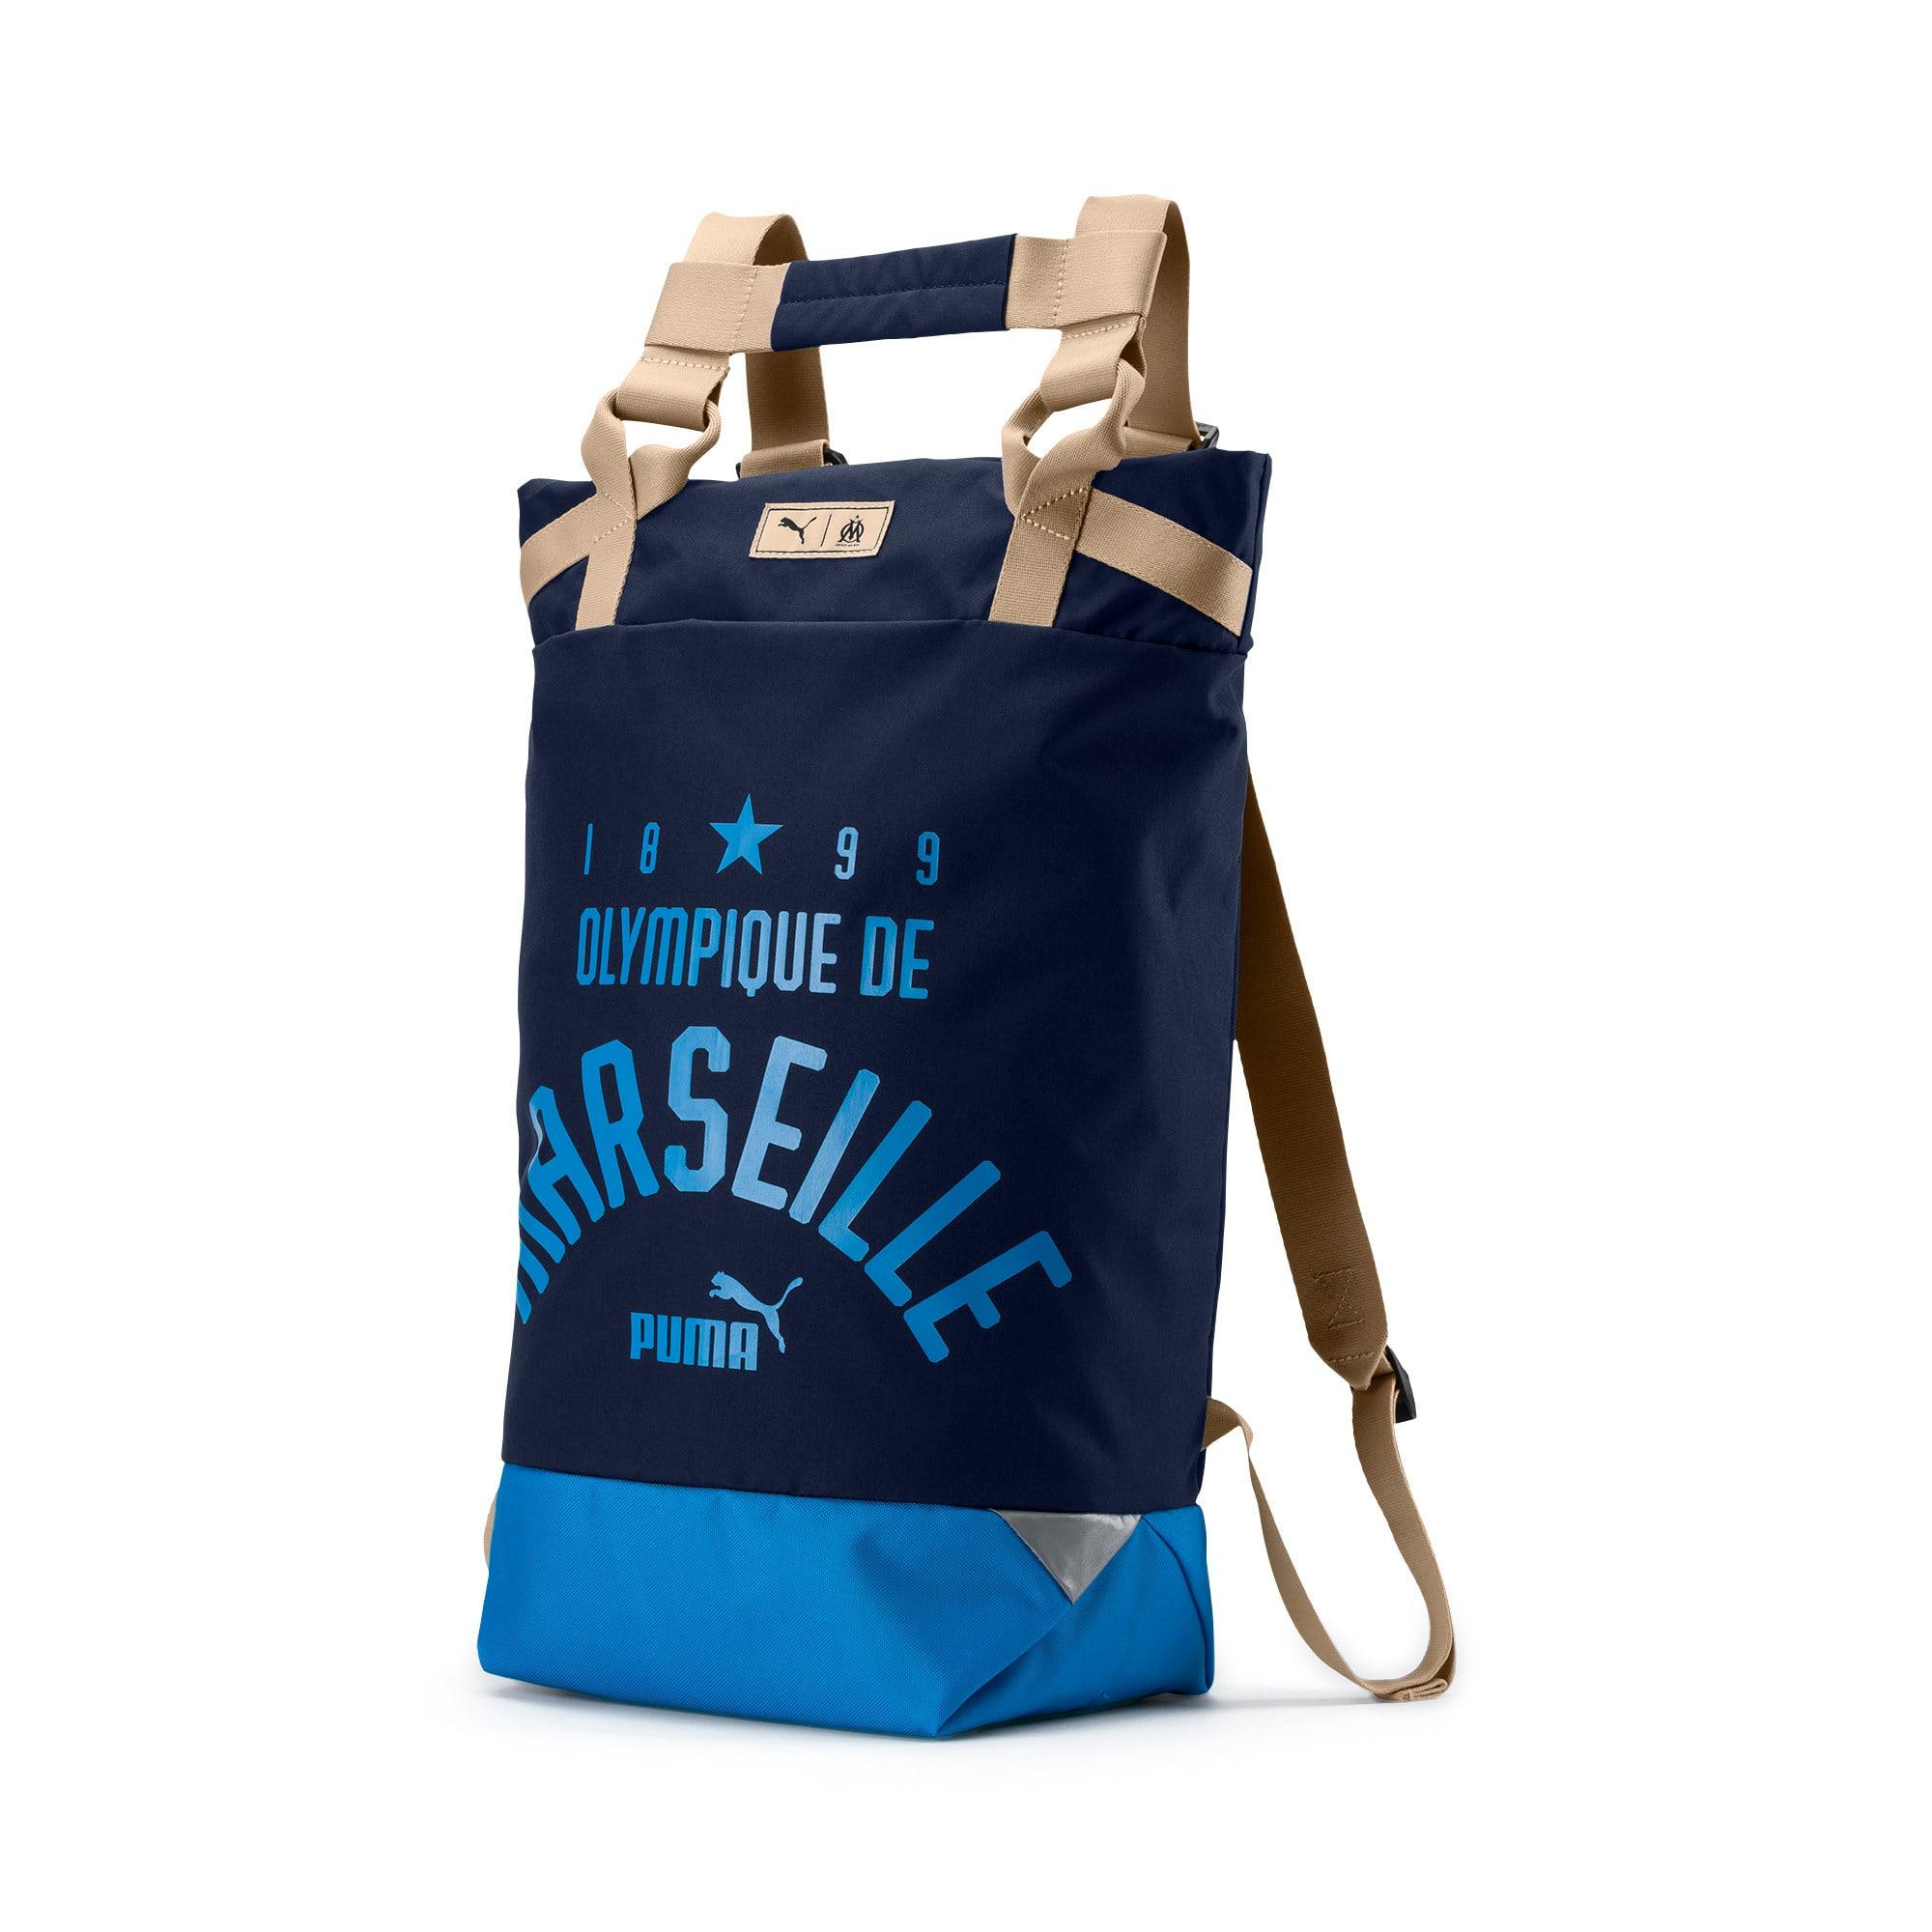 Thumbnail 1 of Olympique de Marseille Premium Tote Backpack, Peacoat-Bleu Azur-Beige, medium-IND